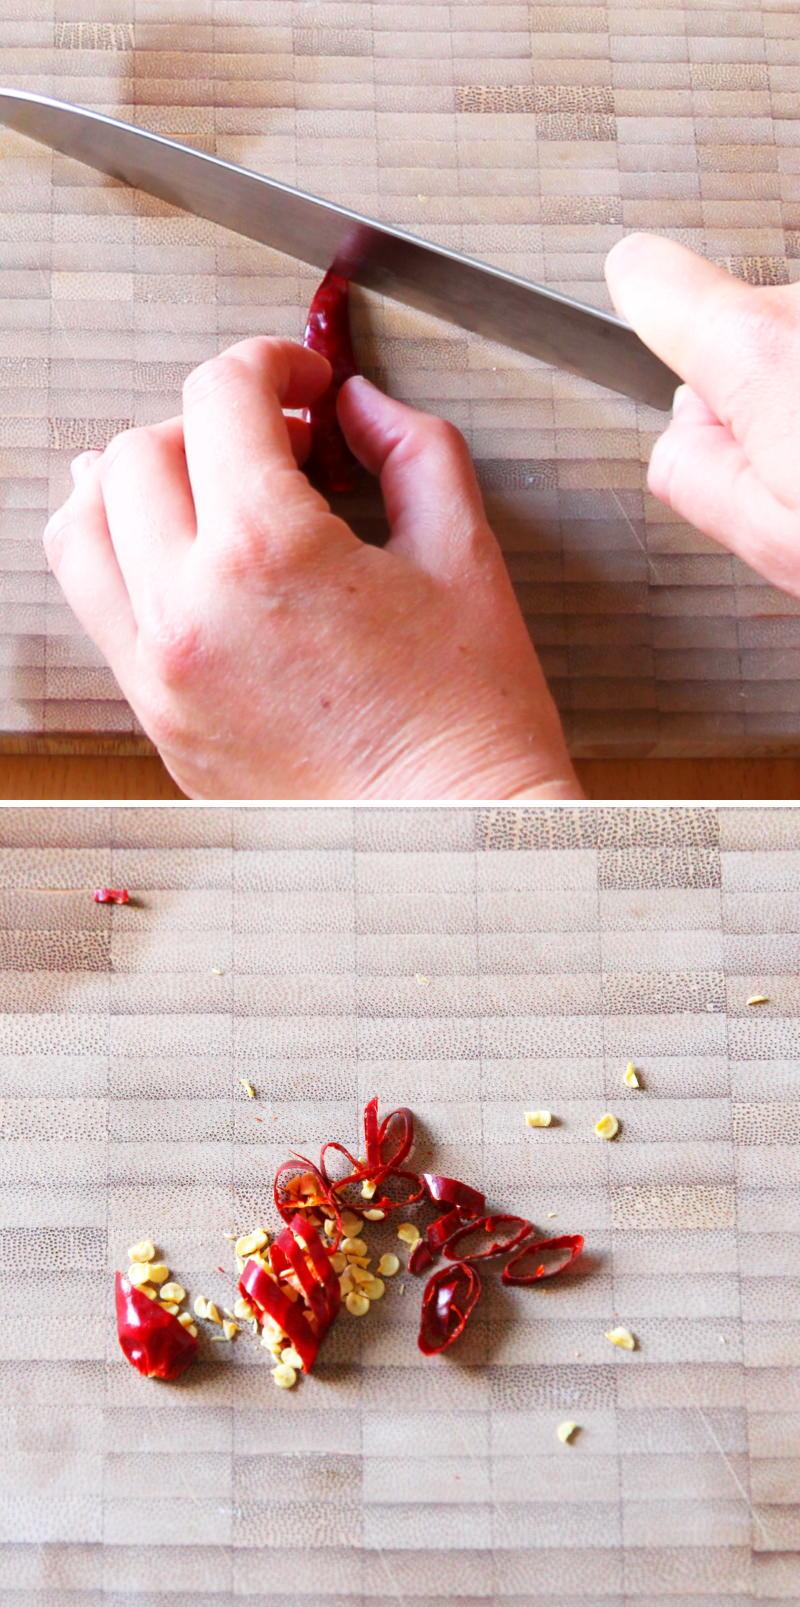 Asari no Sakamushi Schritt 5 Chili schneiden